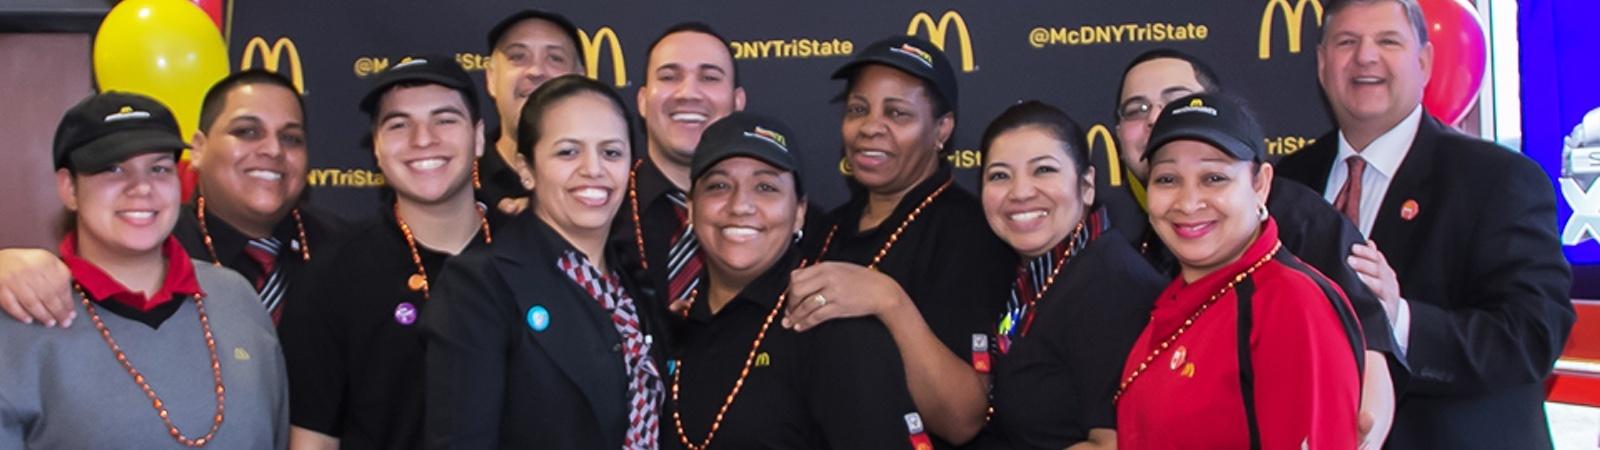 McDonald's Employees.jpg